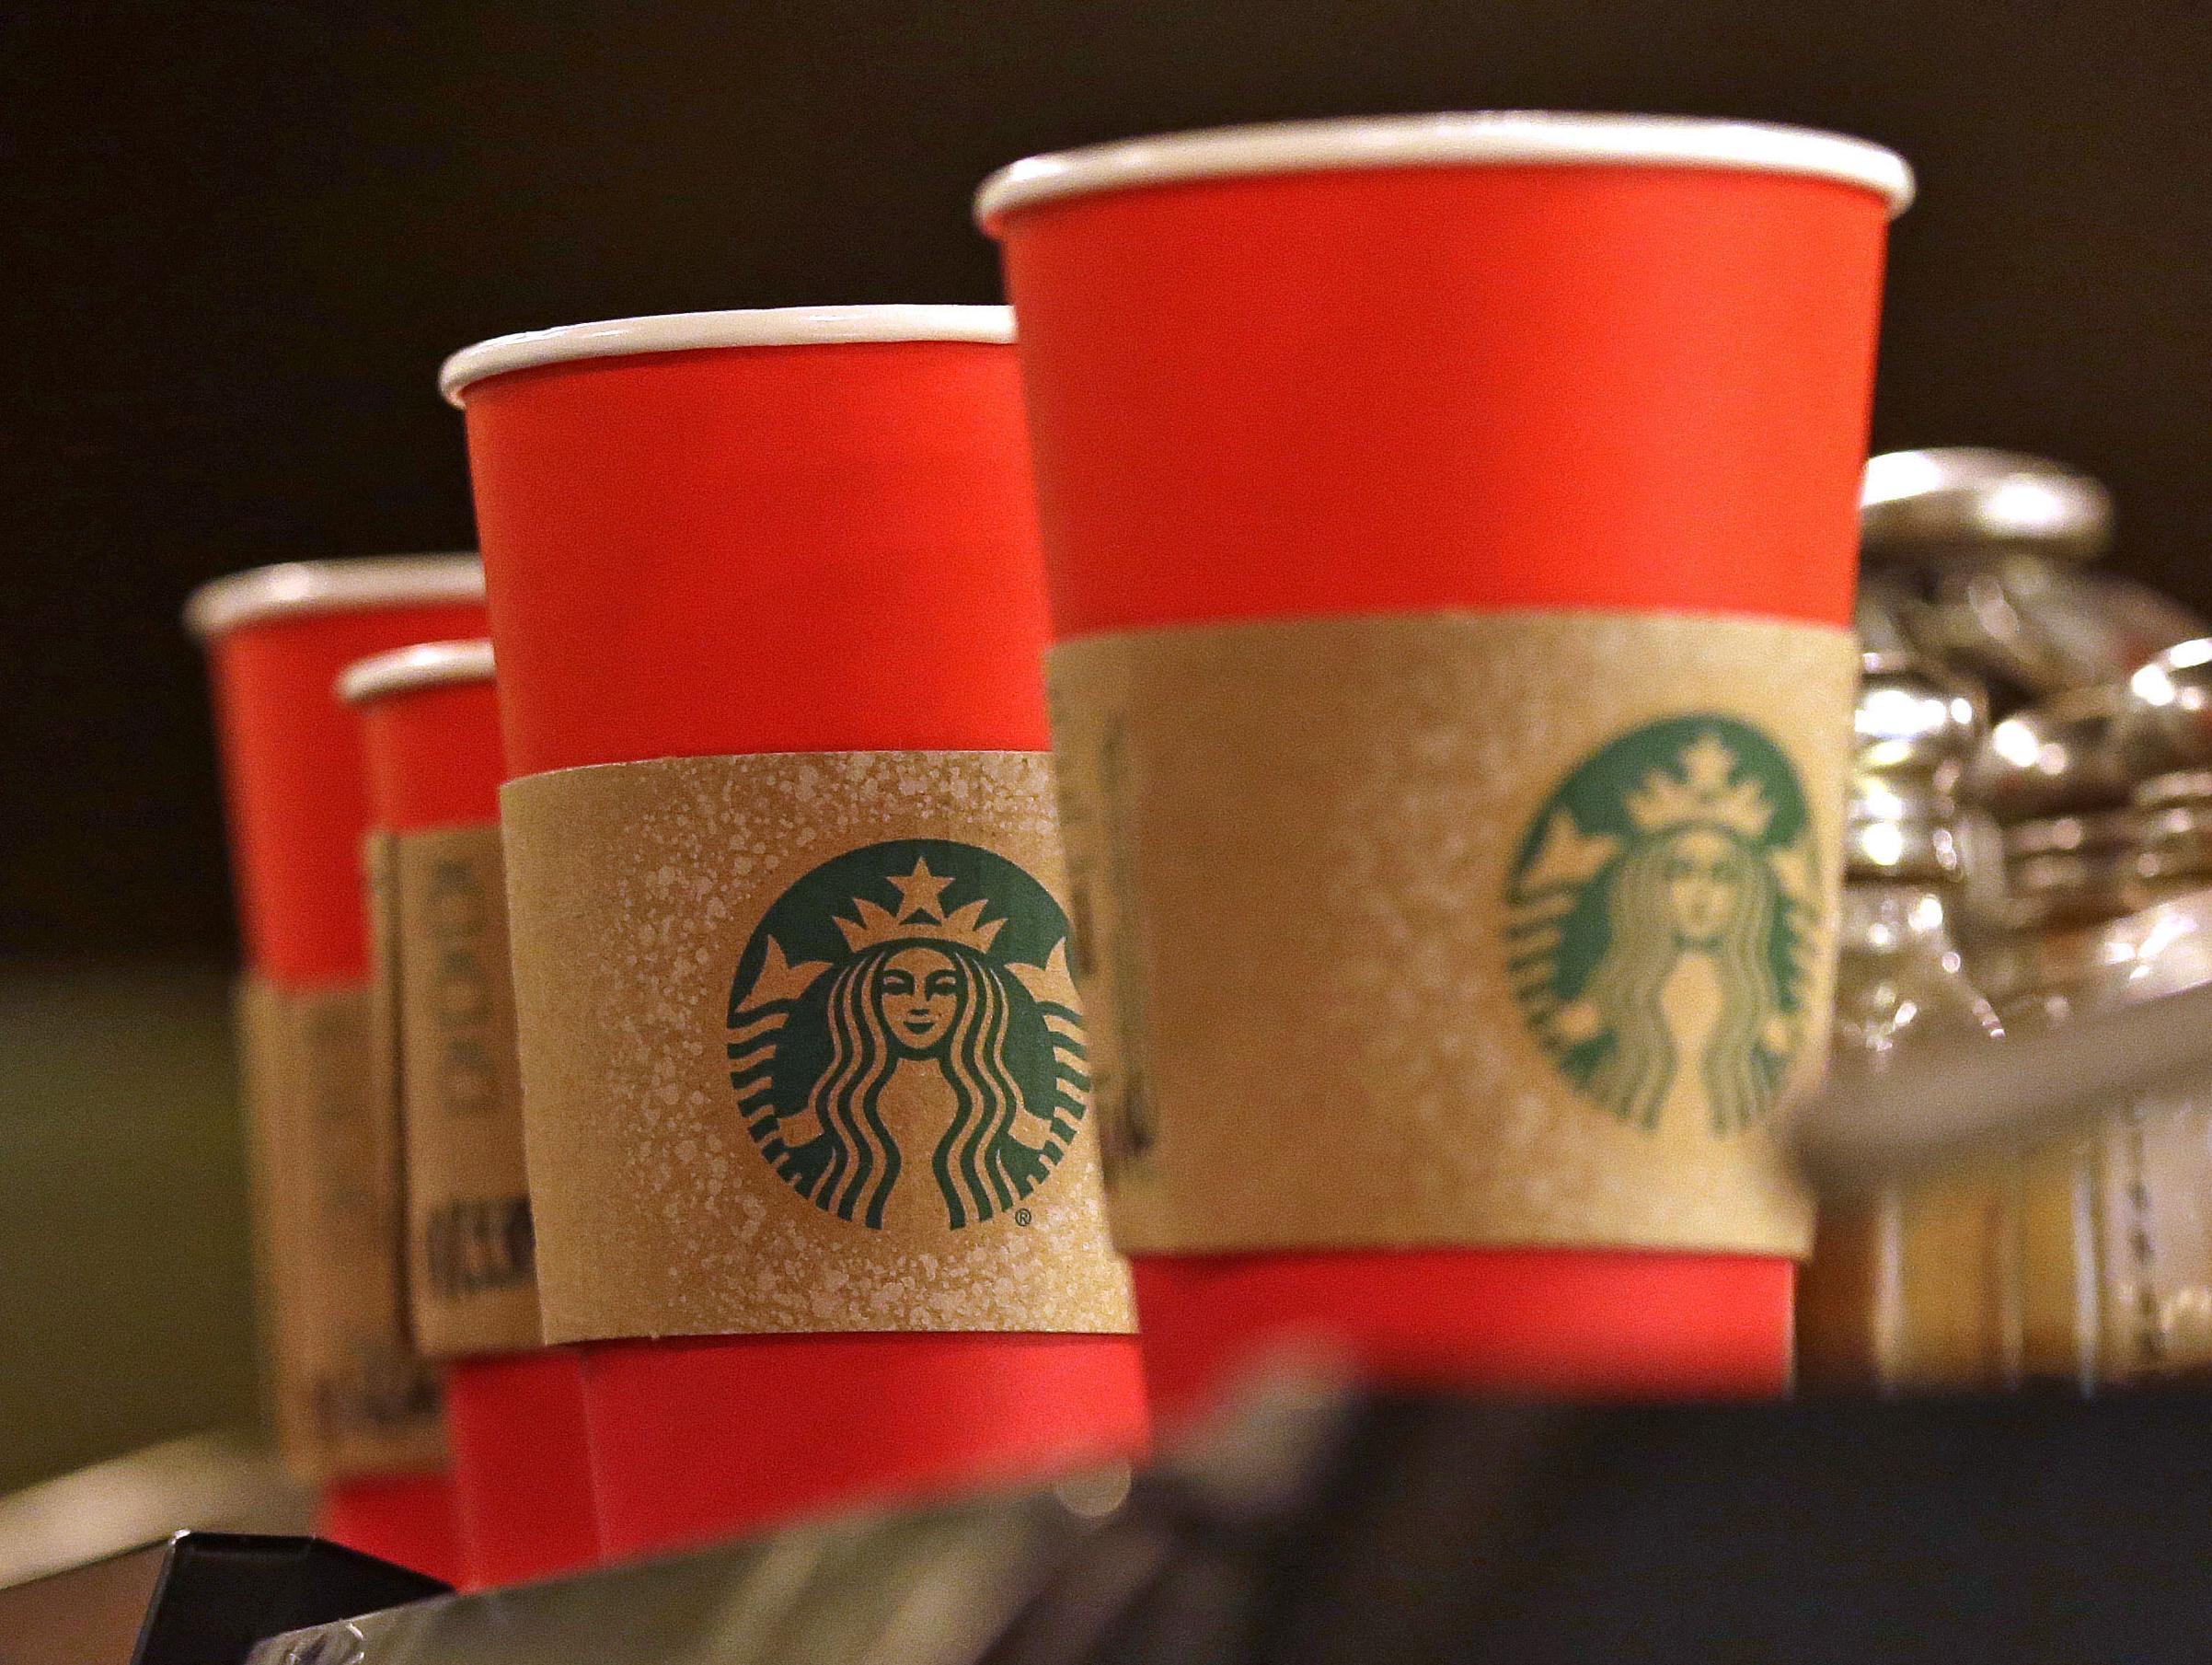 War on Christmas? Starbucks cups cause social media outcry | The ...